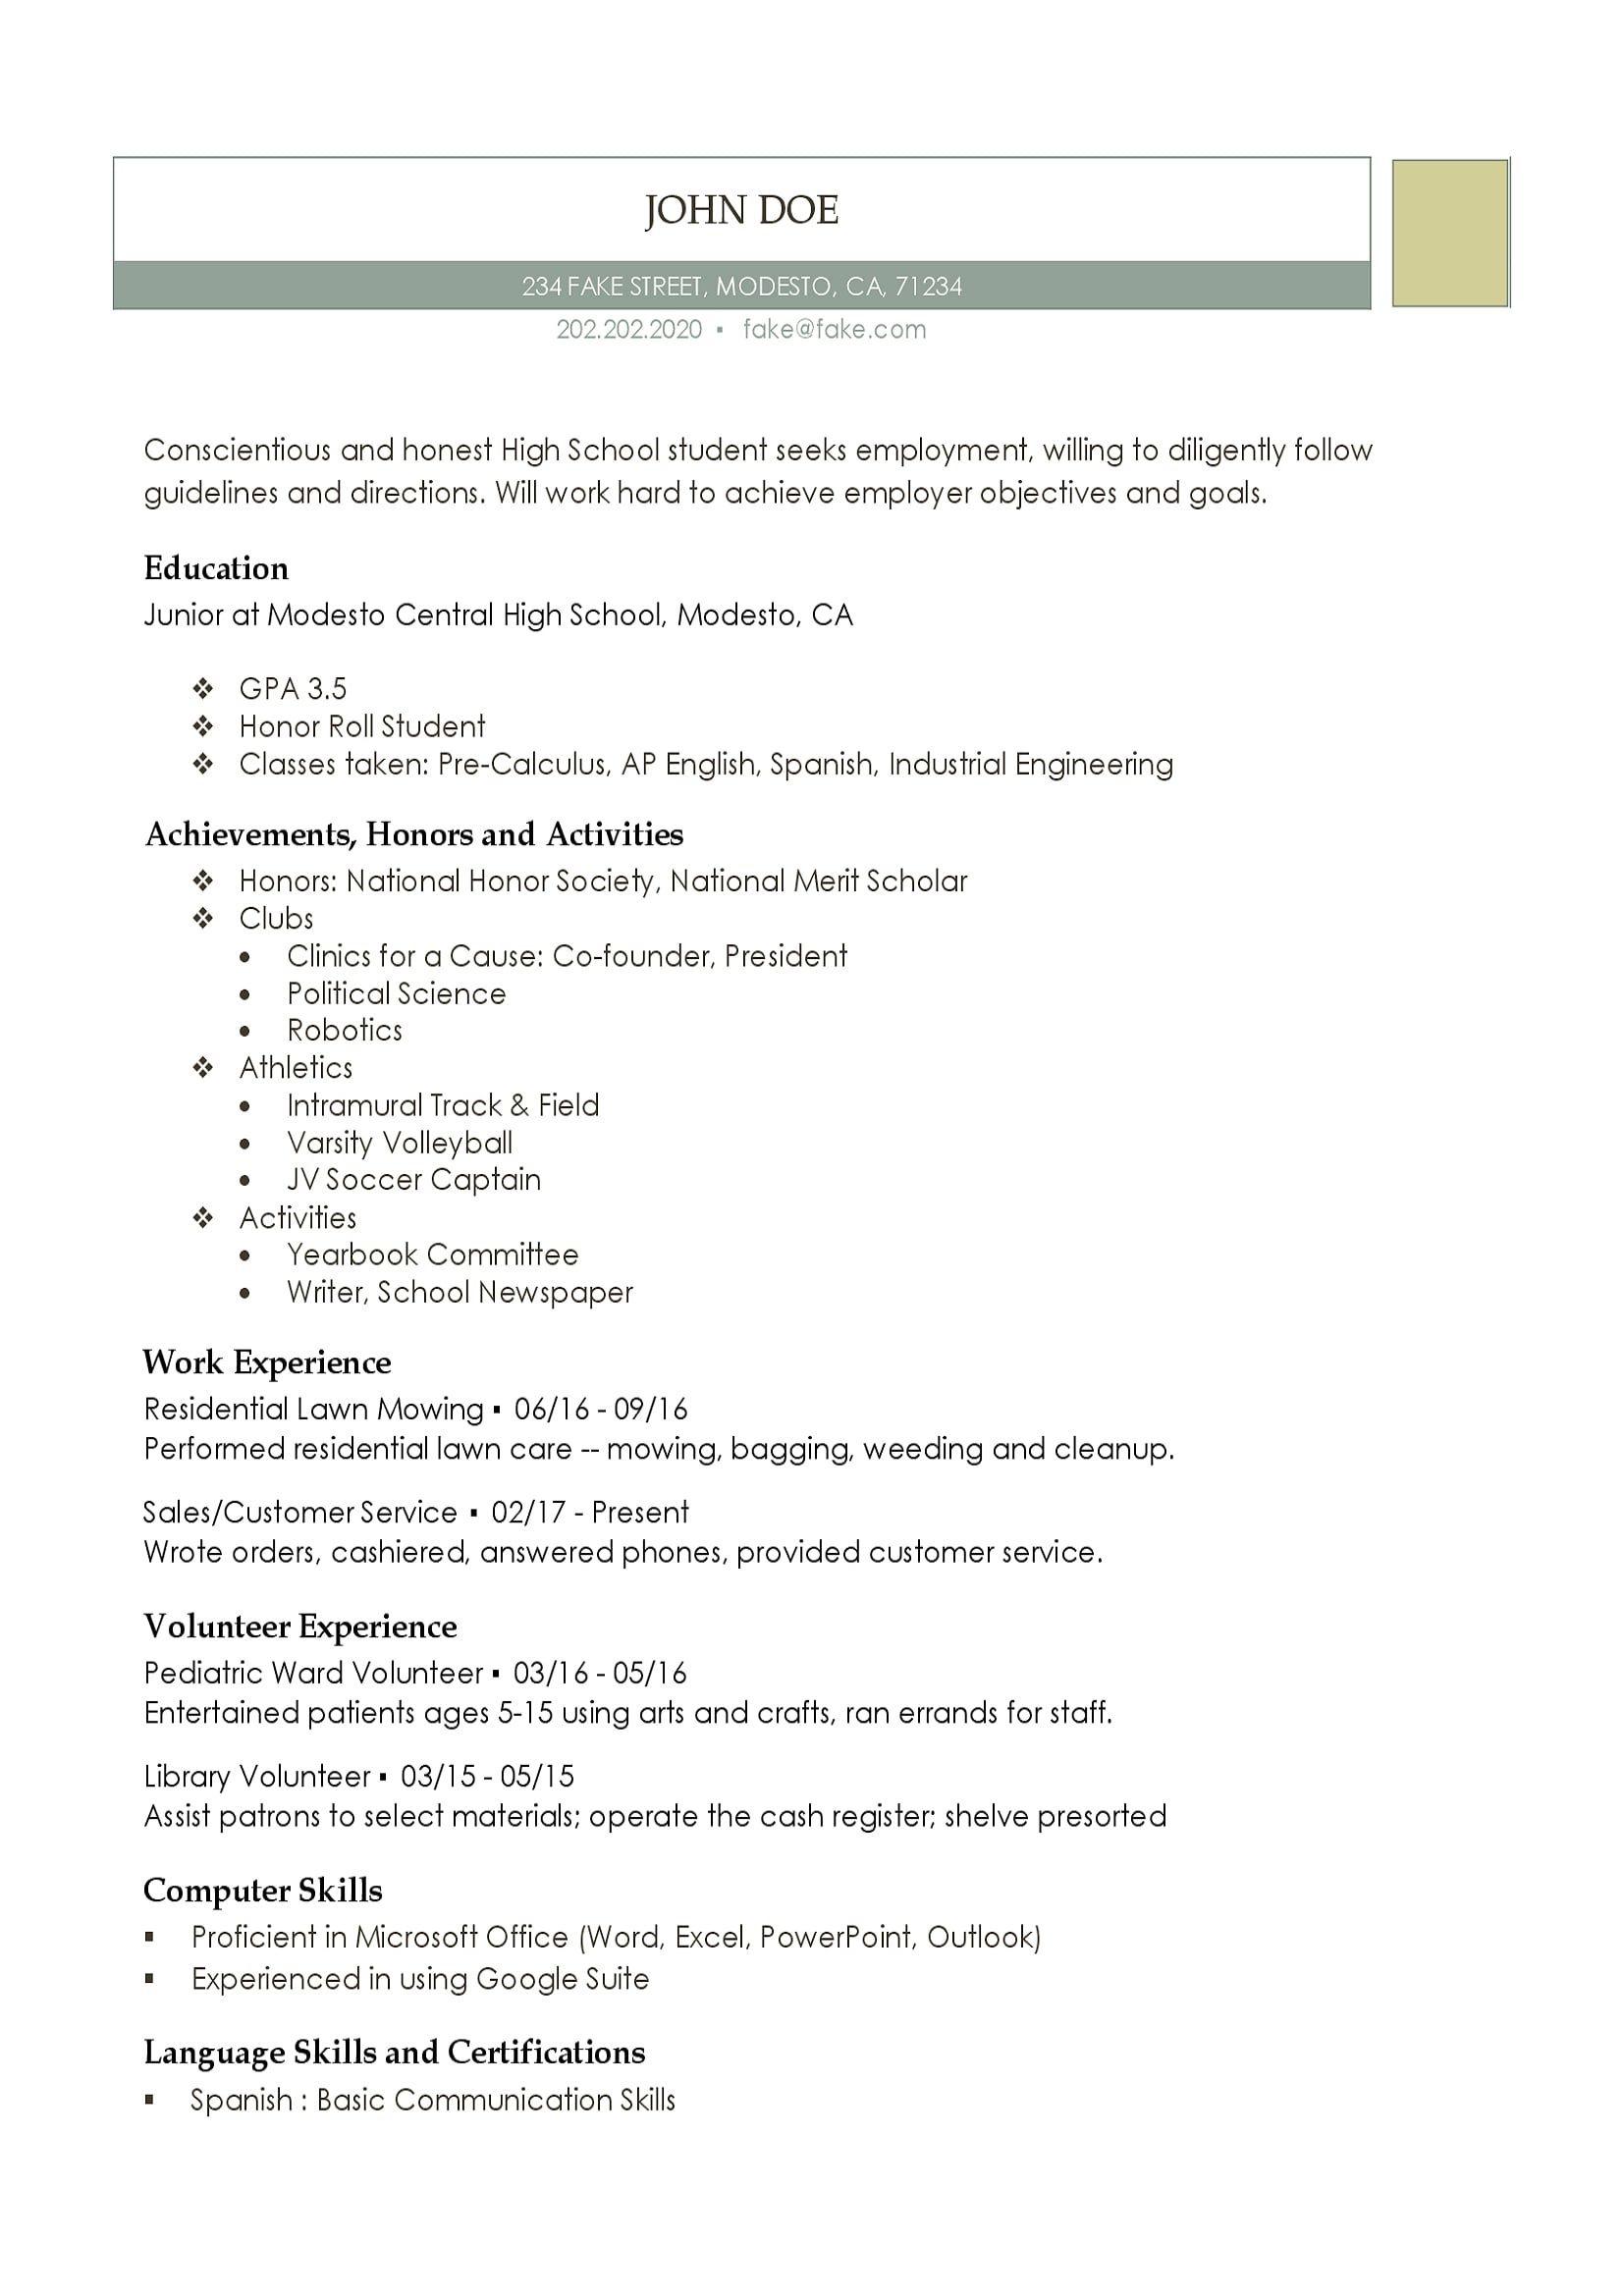 001 Fantastic High School Student Resume Template Resolution  Free Microsoft Word 2010Full